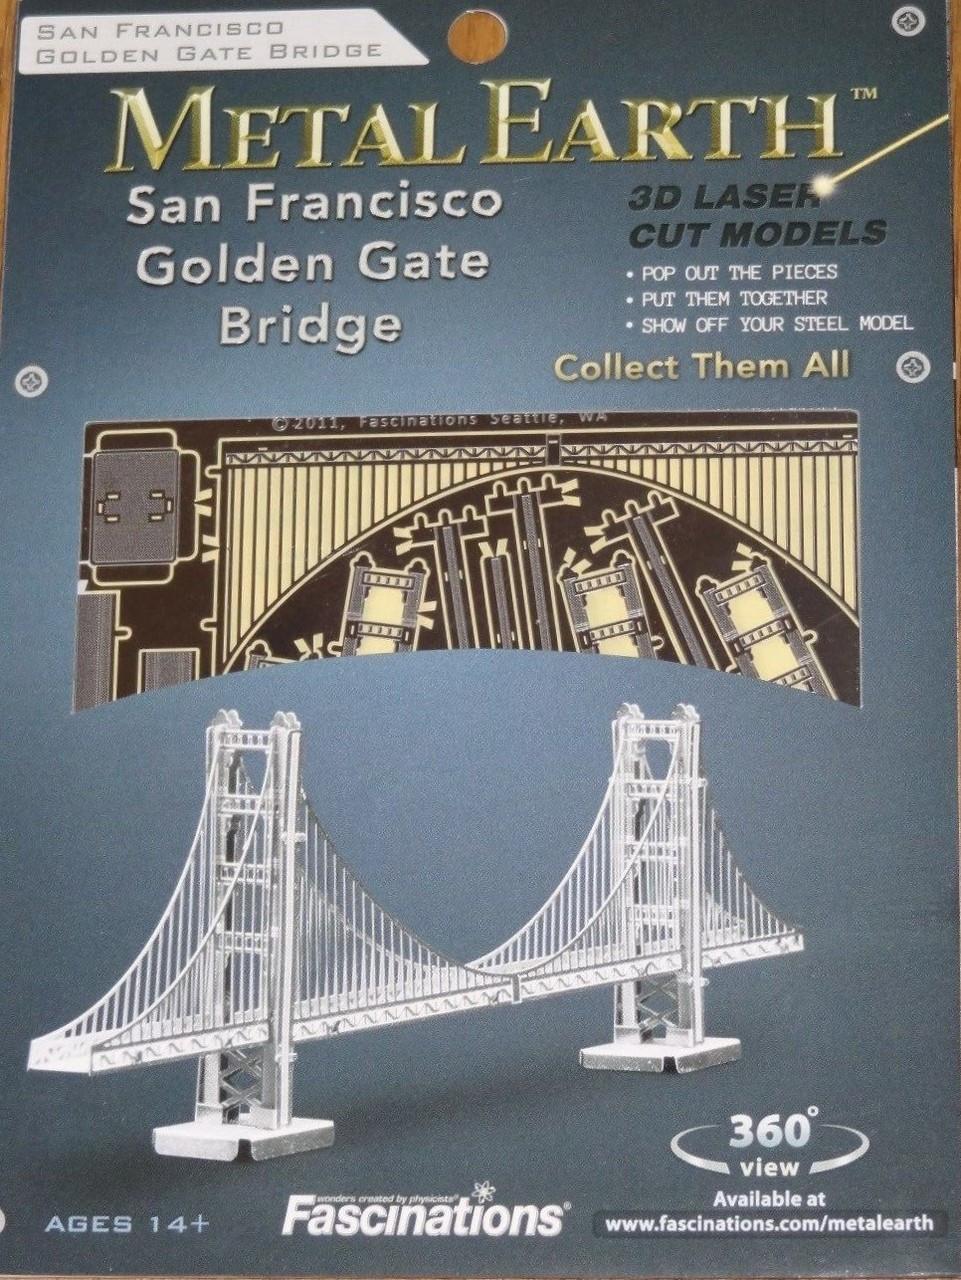 Fascinations Metal Earth 3D Laser Cut Steel Model Kit GOLD Golden Gate Bridge